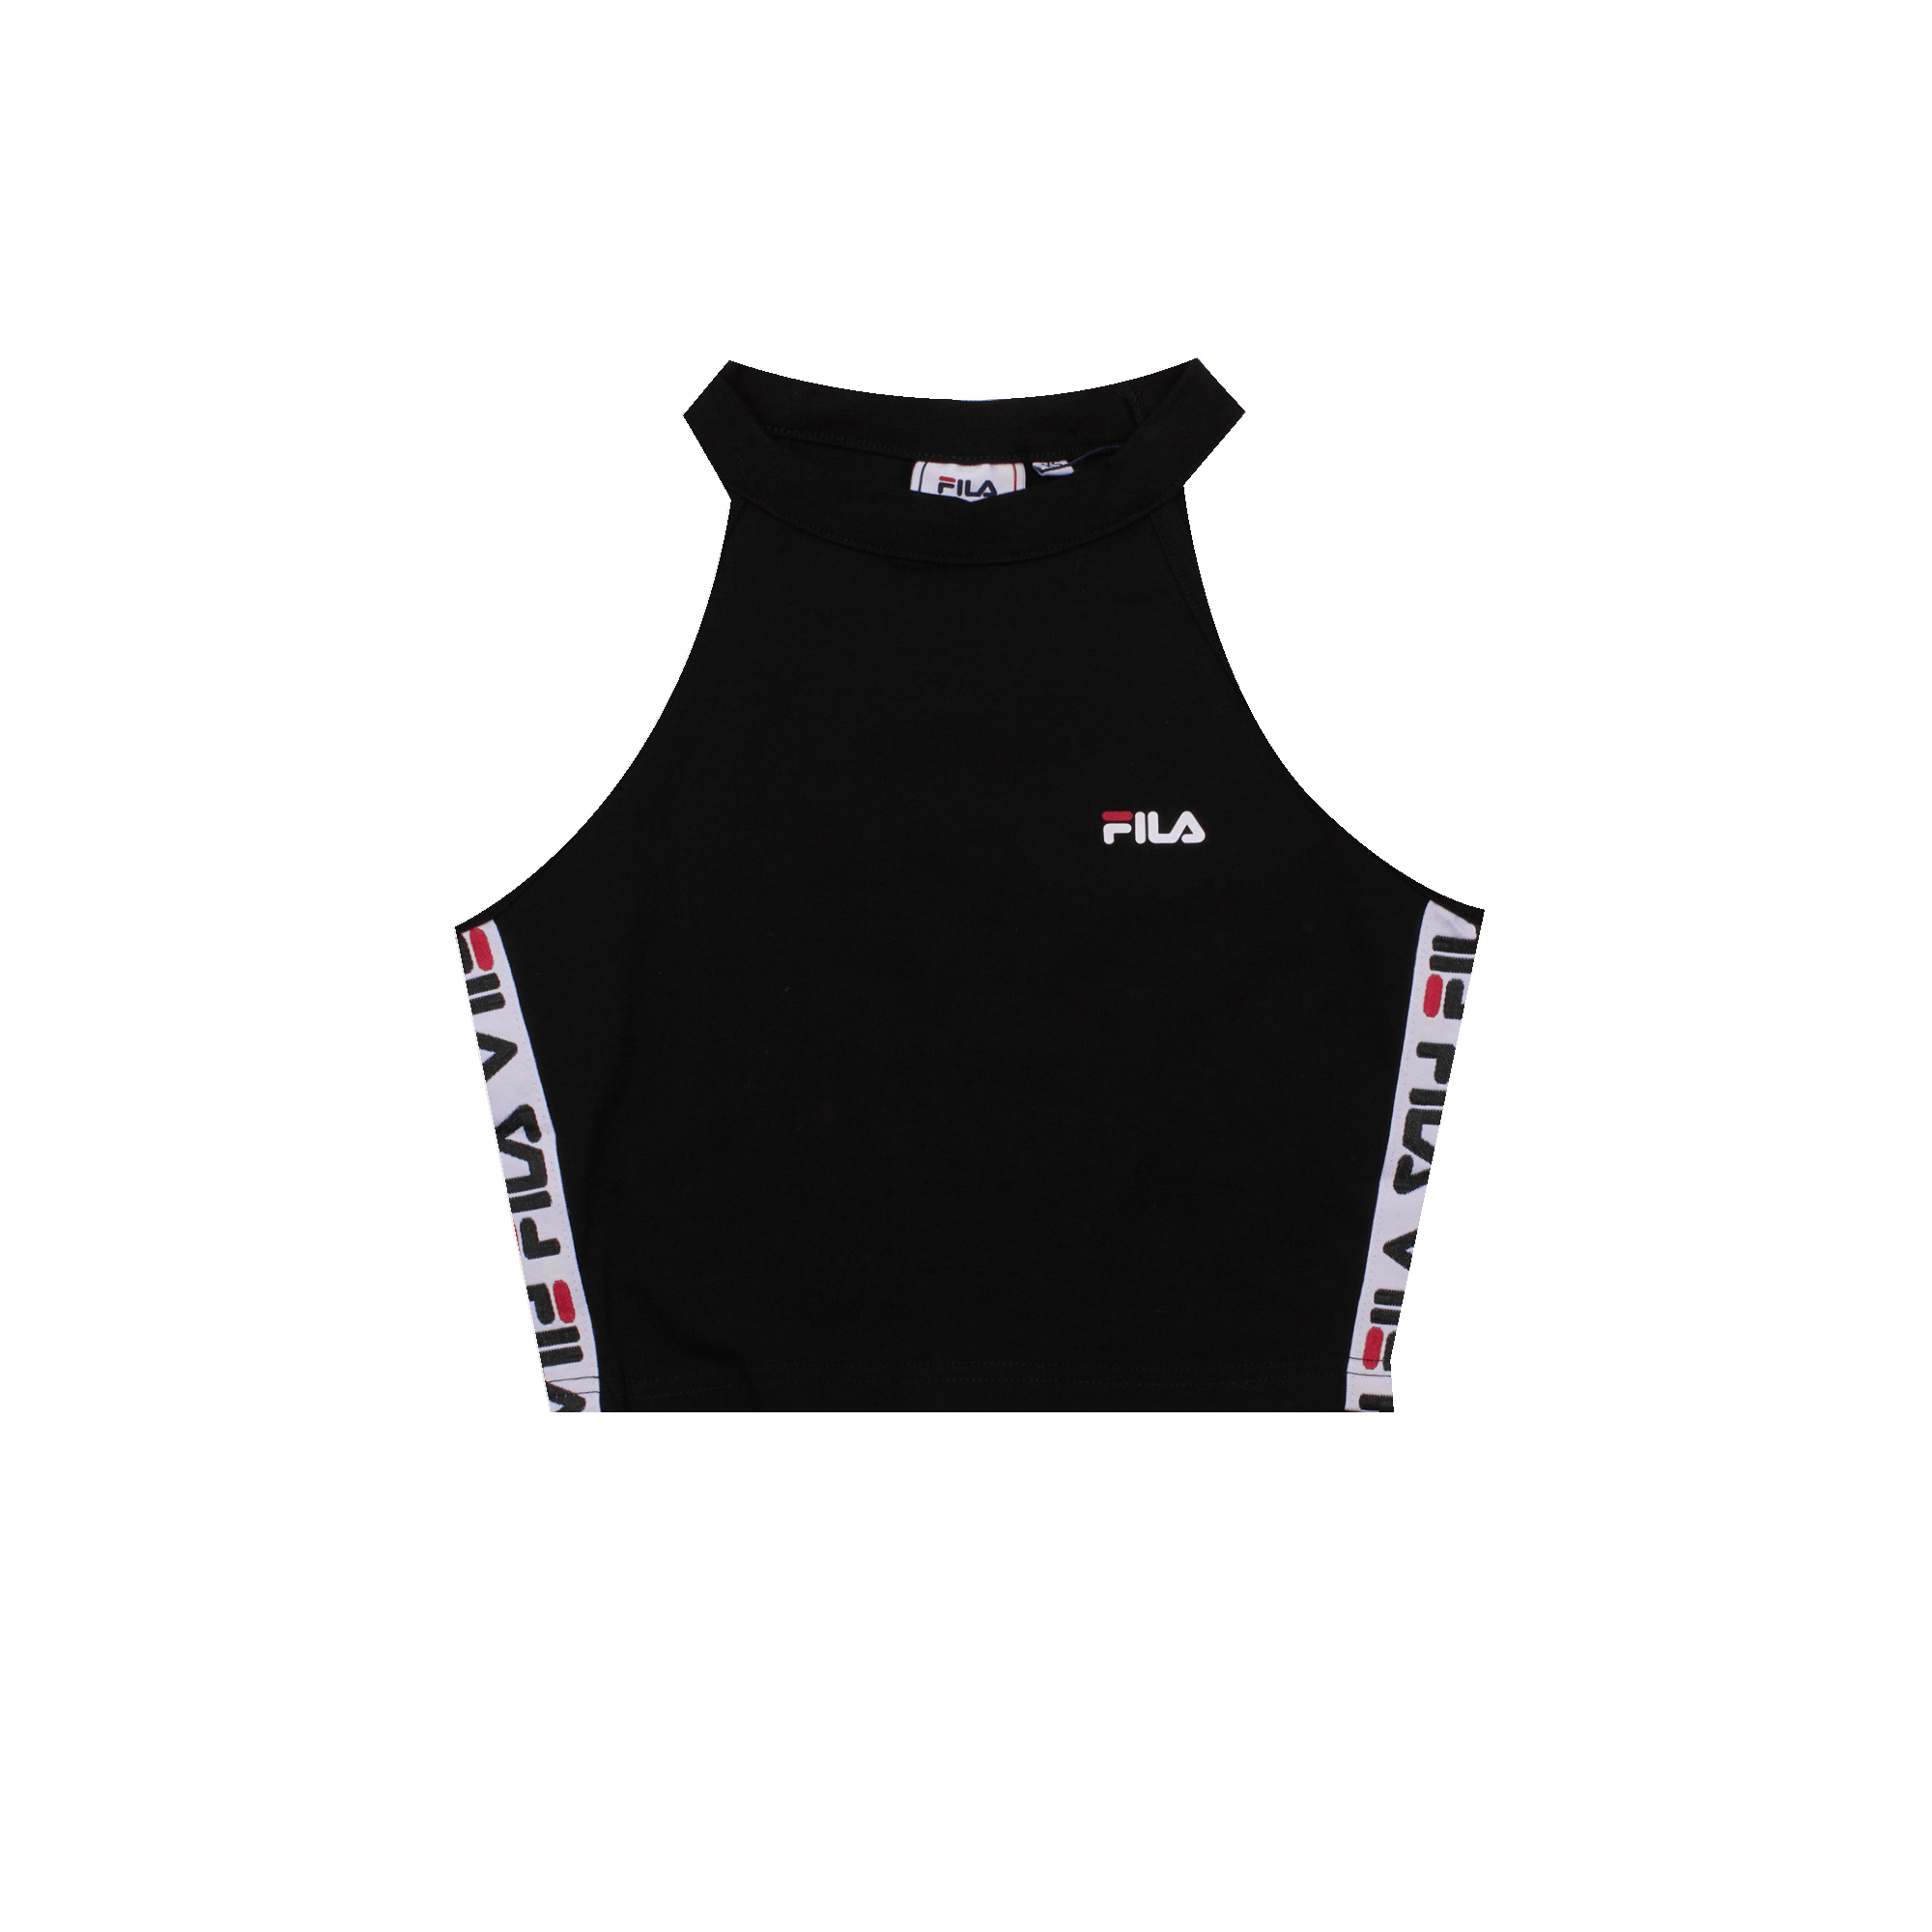 Fila Melody Cropped Top black T shirt |